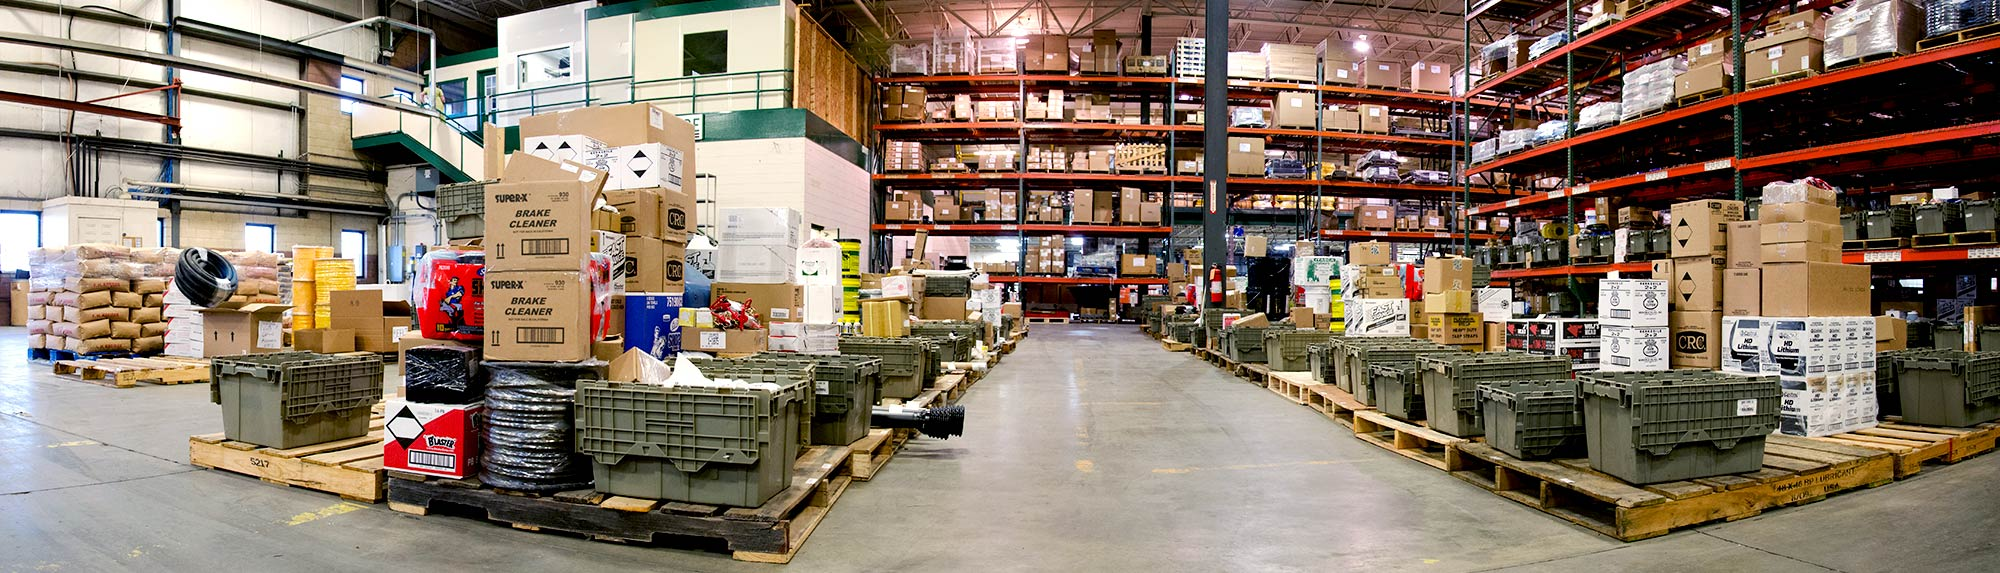 image PaulB Wholesale early order program